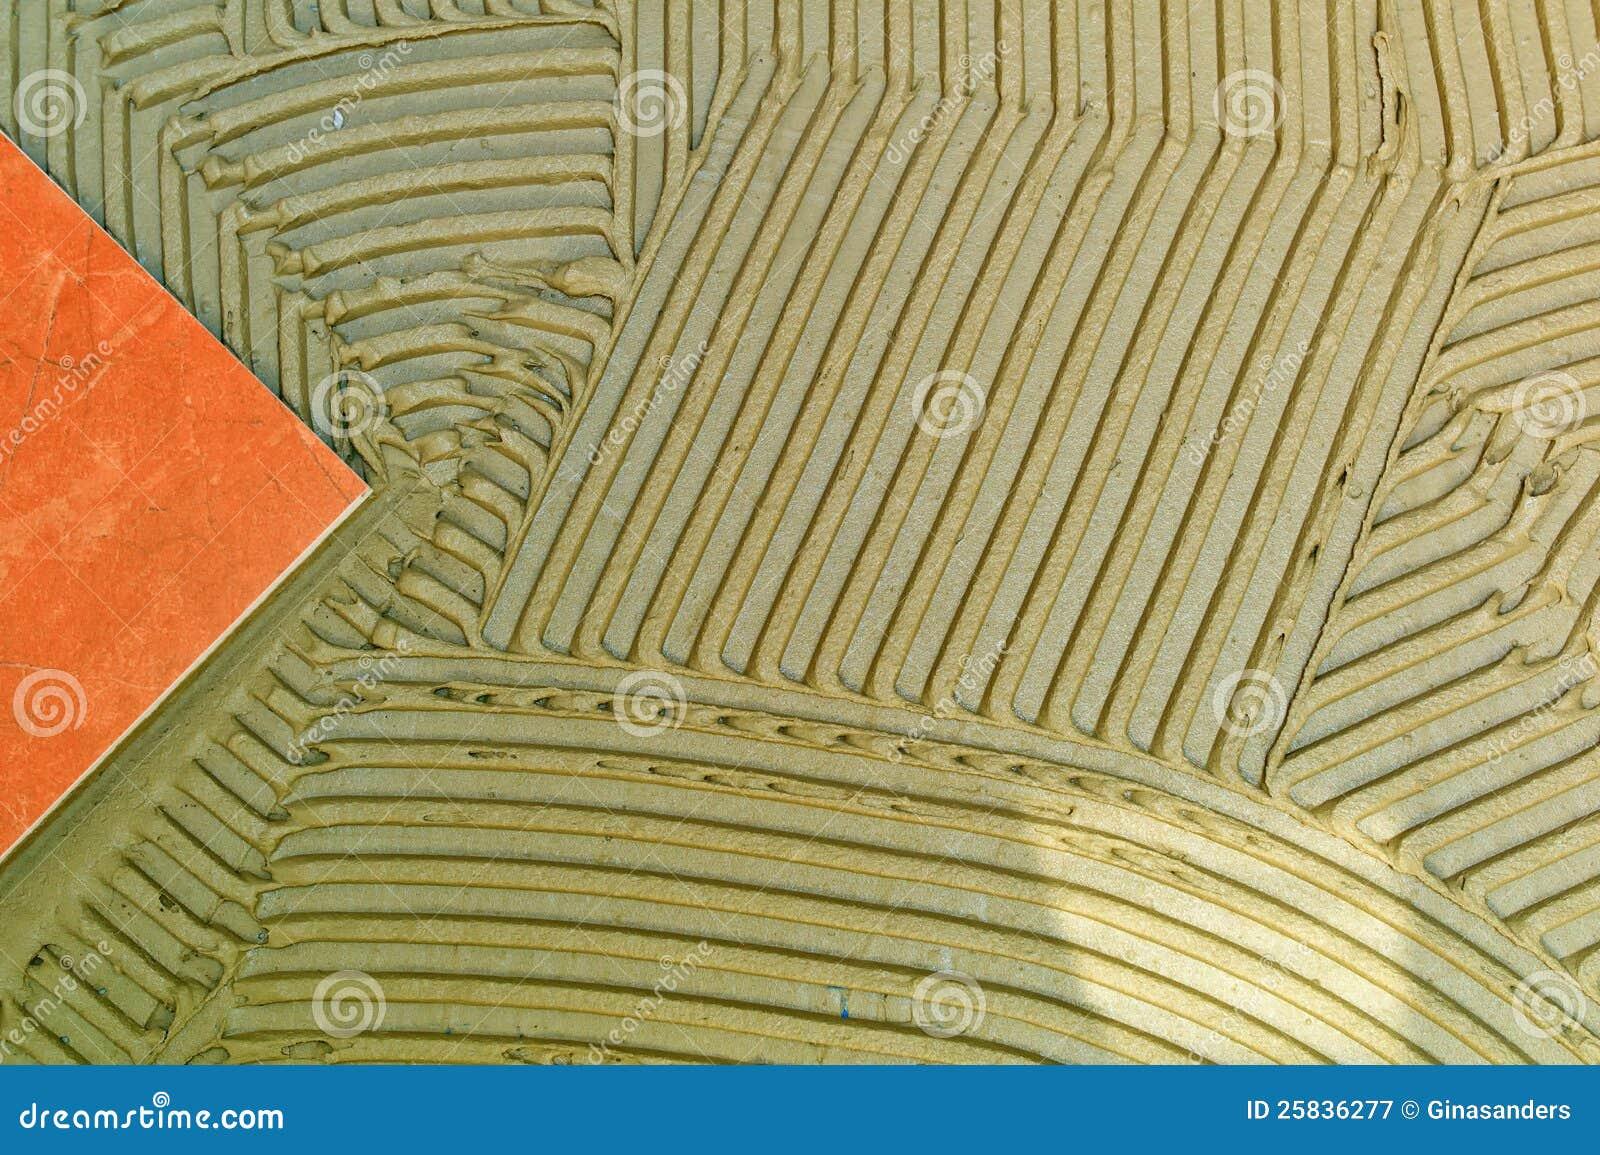 Tile adhesive on a wall